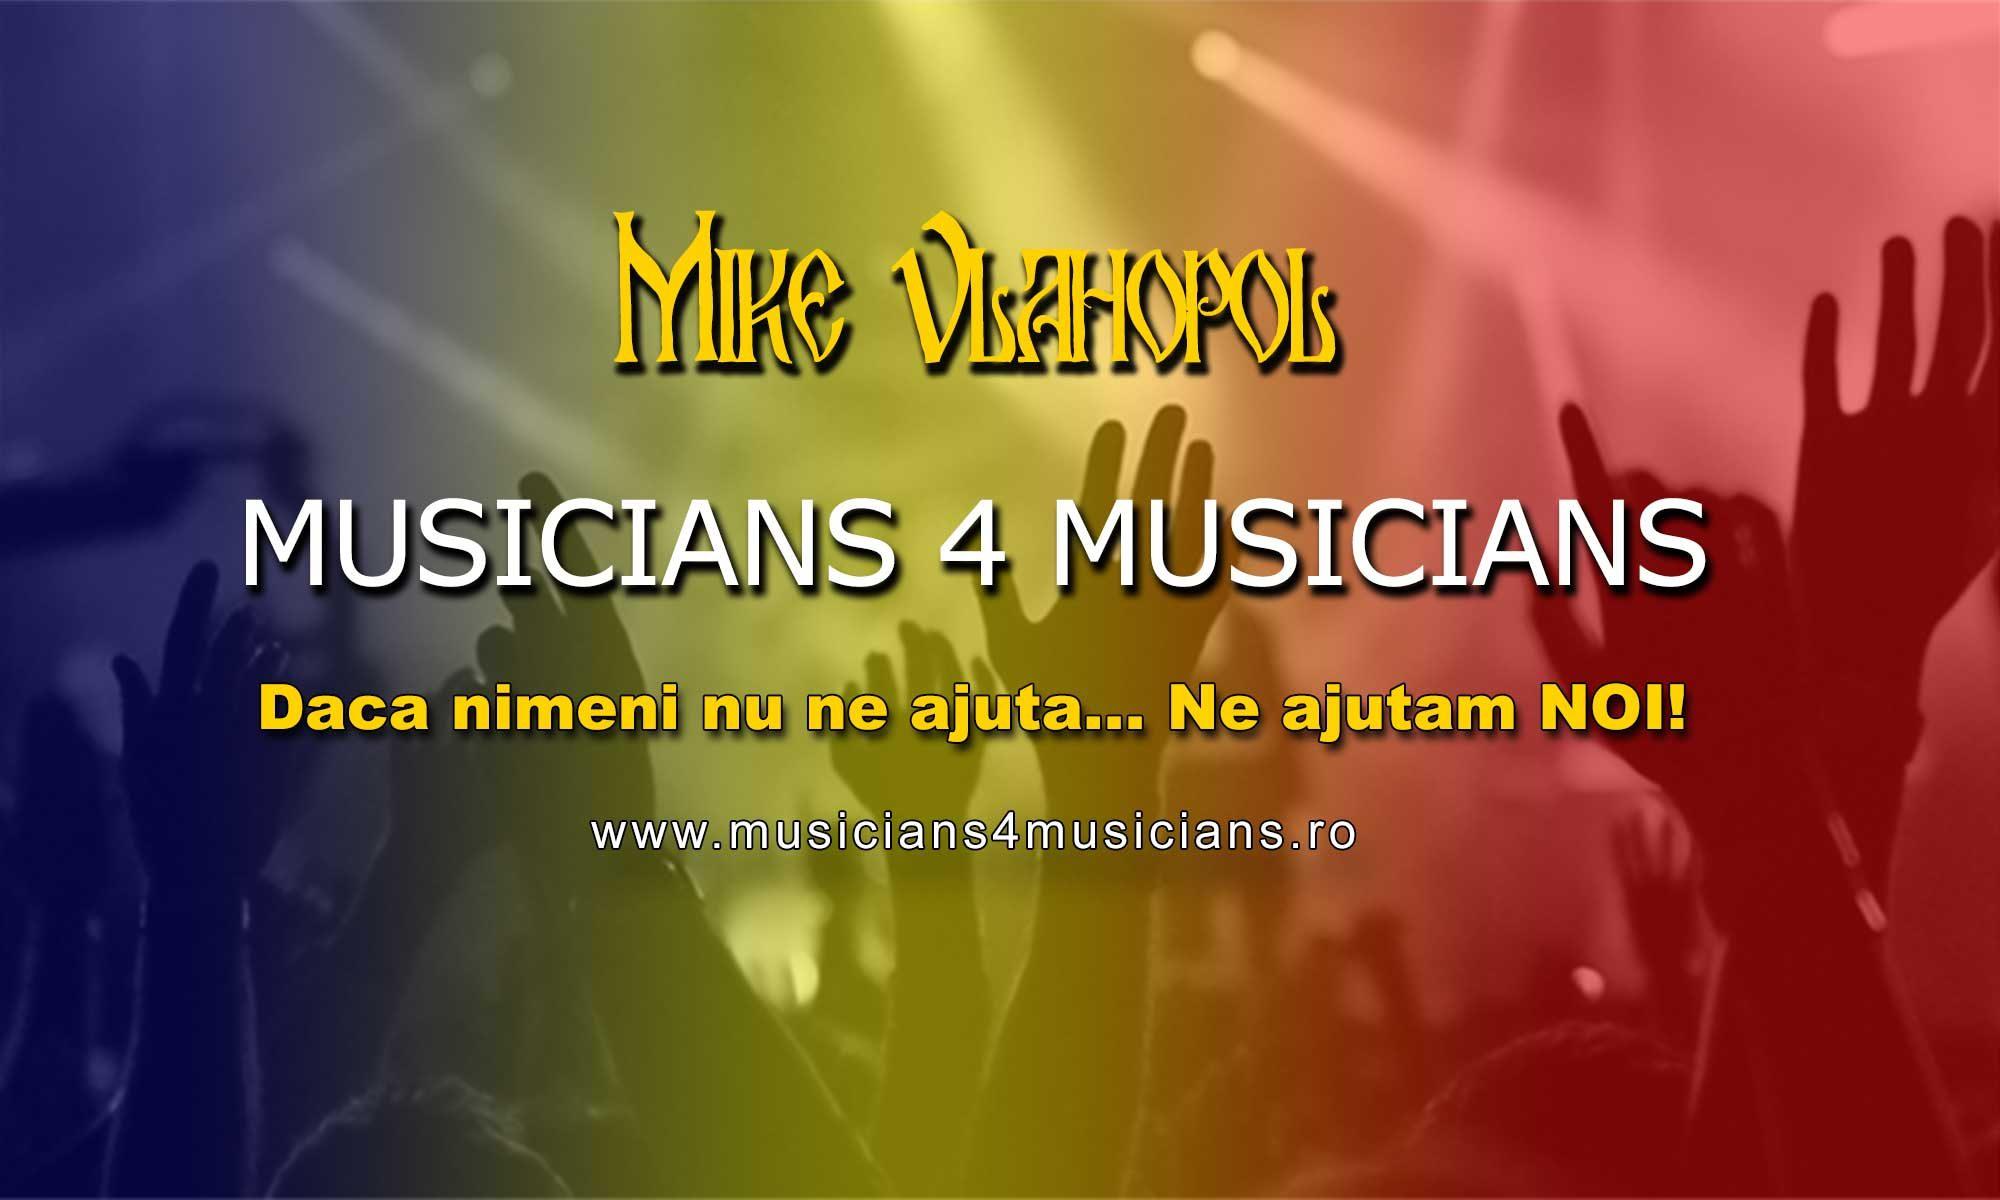 Mike Vlahopol - Musicians 4 Musicians